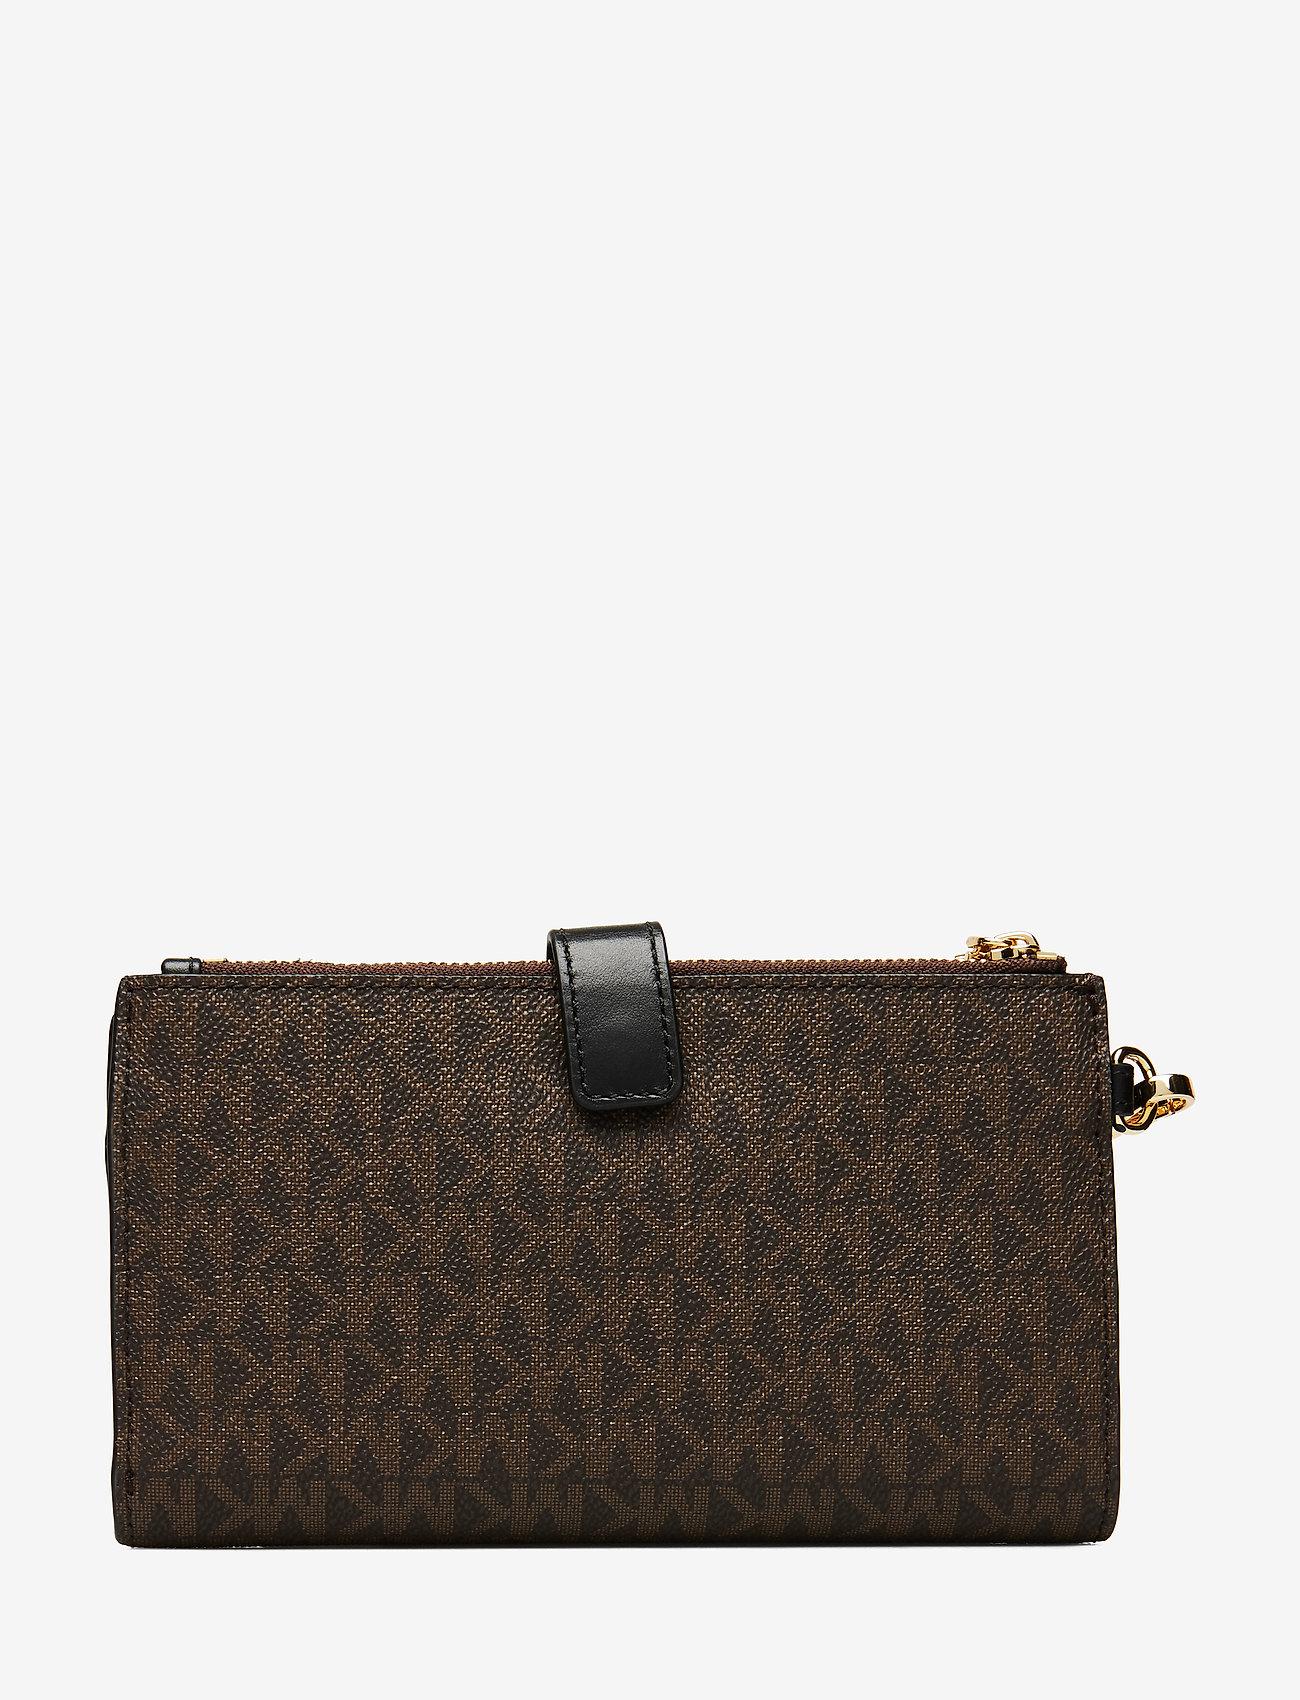 Michael Kors Bags - DBLZP WRISTLET - clutches - brown/blk - 1